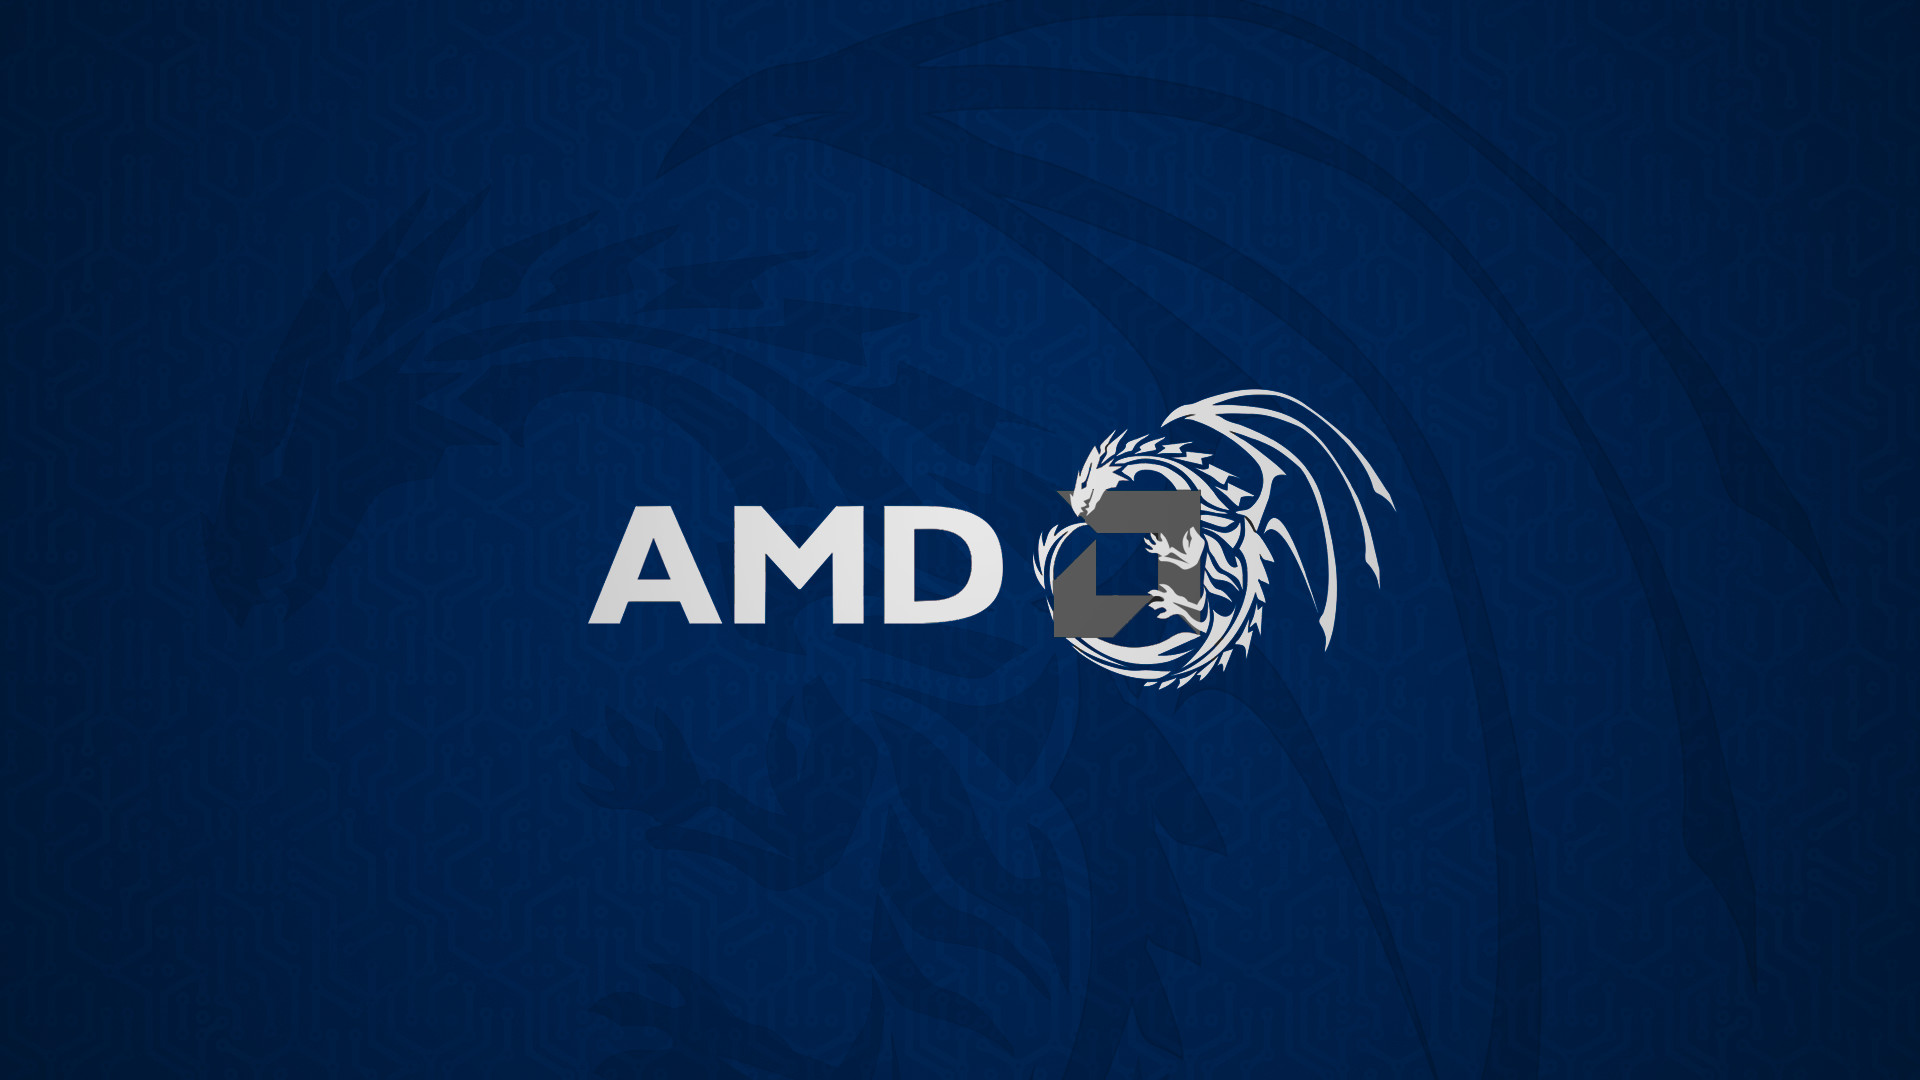 <b>Amd</b> Gaming <b>Hd 1920×1080</